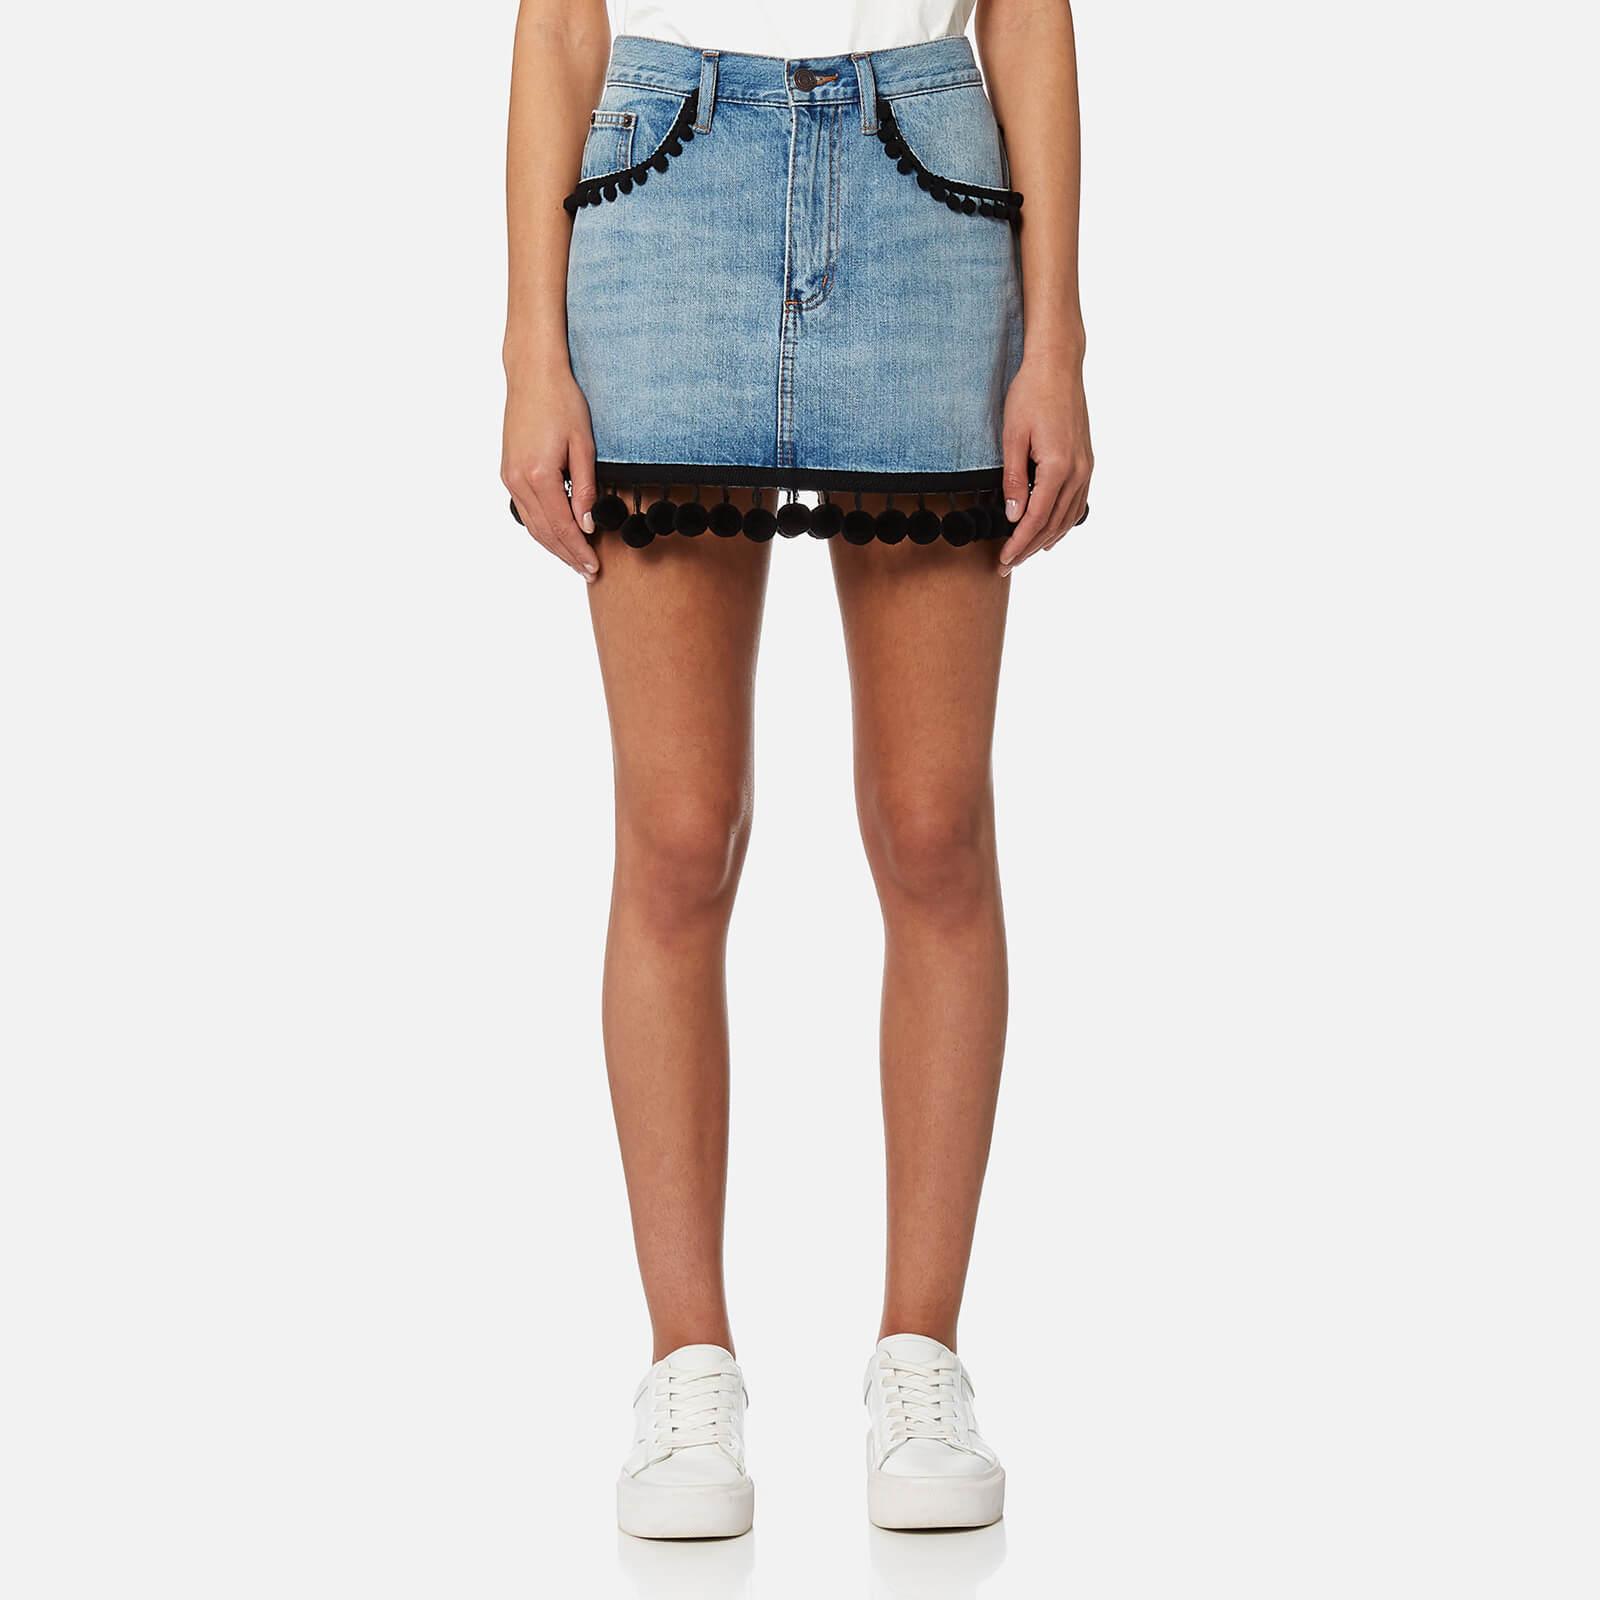 081439ac64 Marc Jacobs Women s Denim Mini Skirt with Pom Poms - Vintage Indigo - Free  UK Delivery over £50